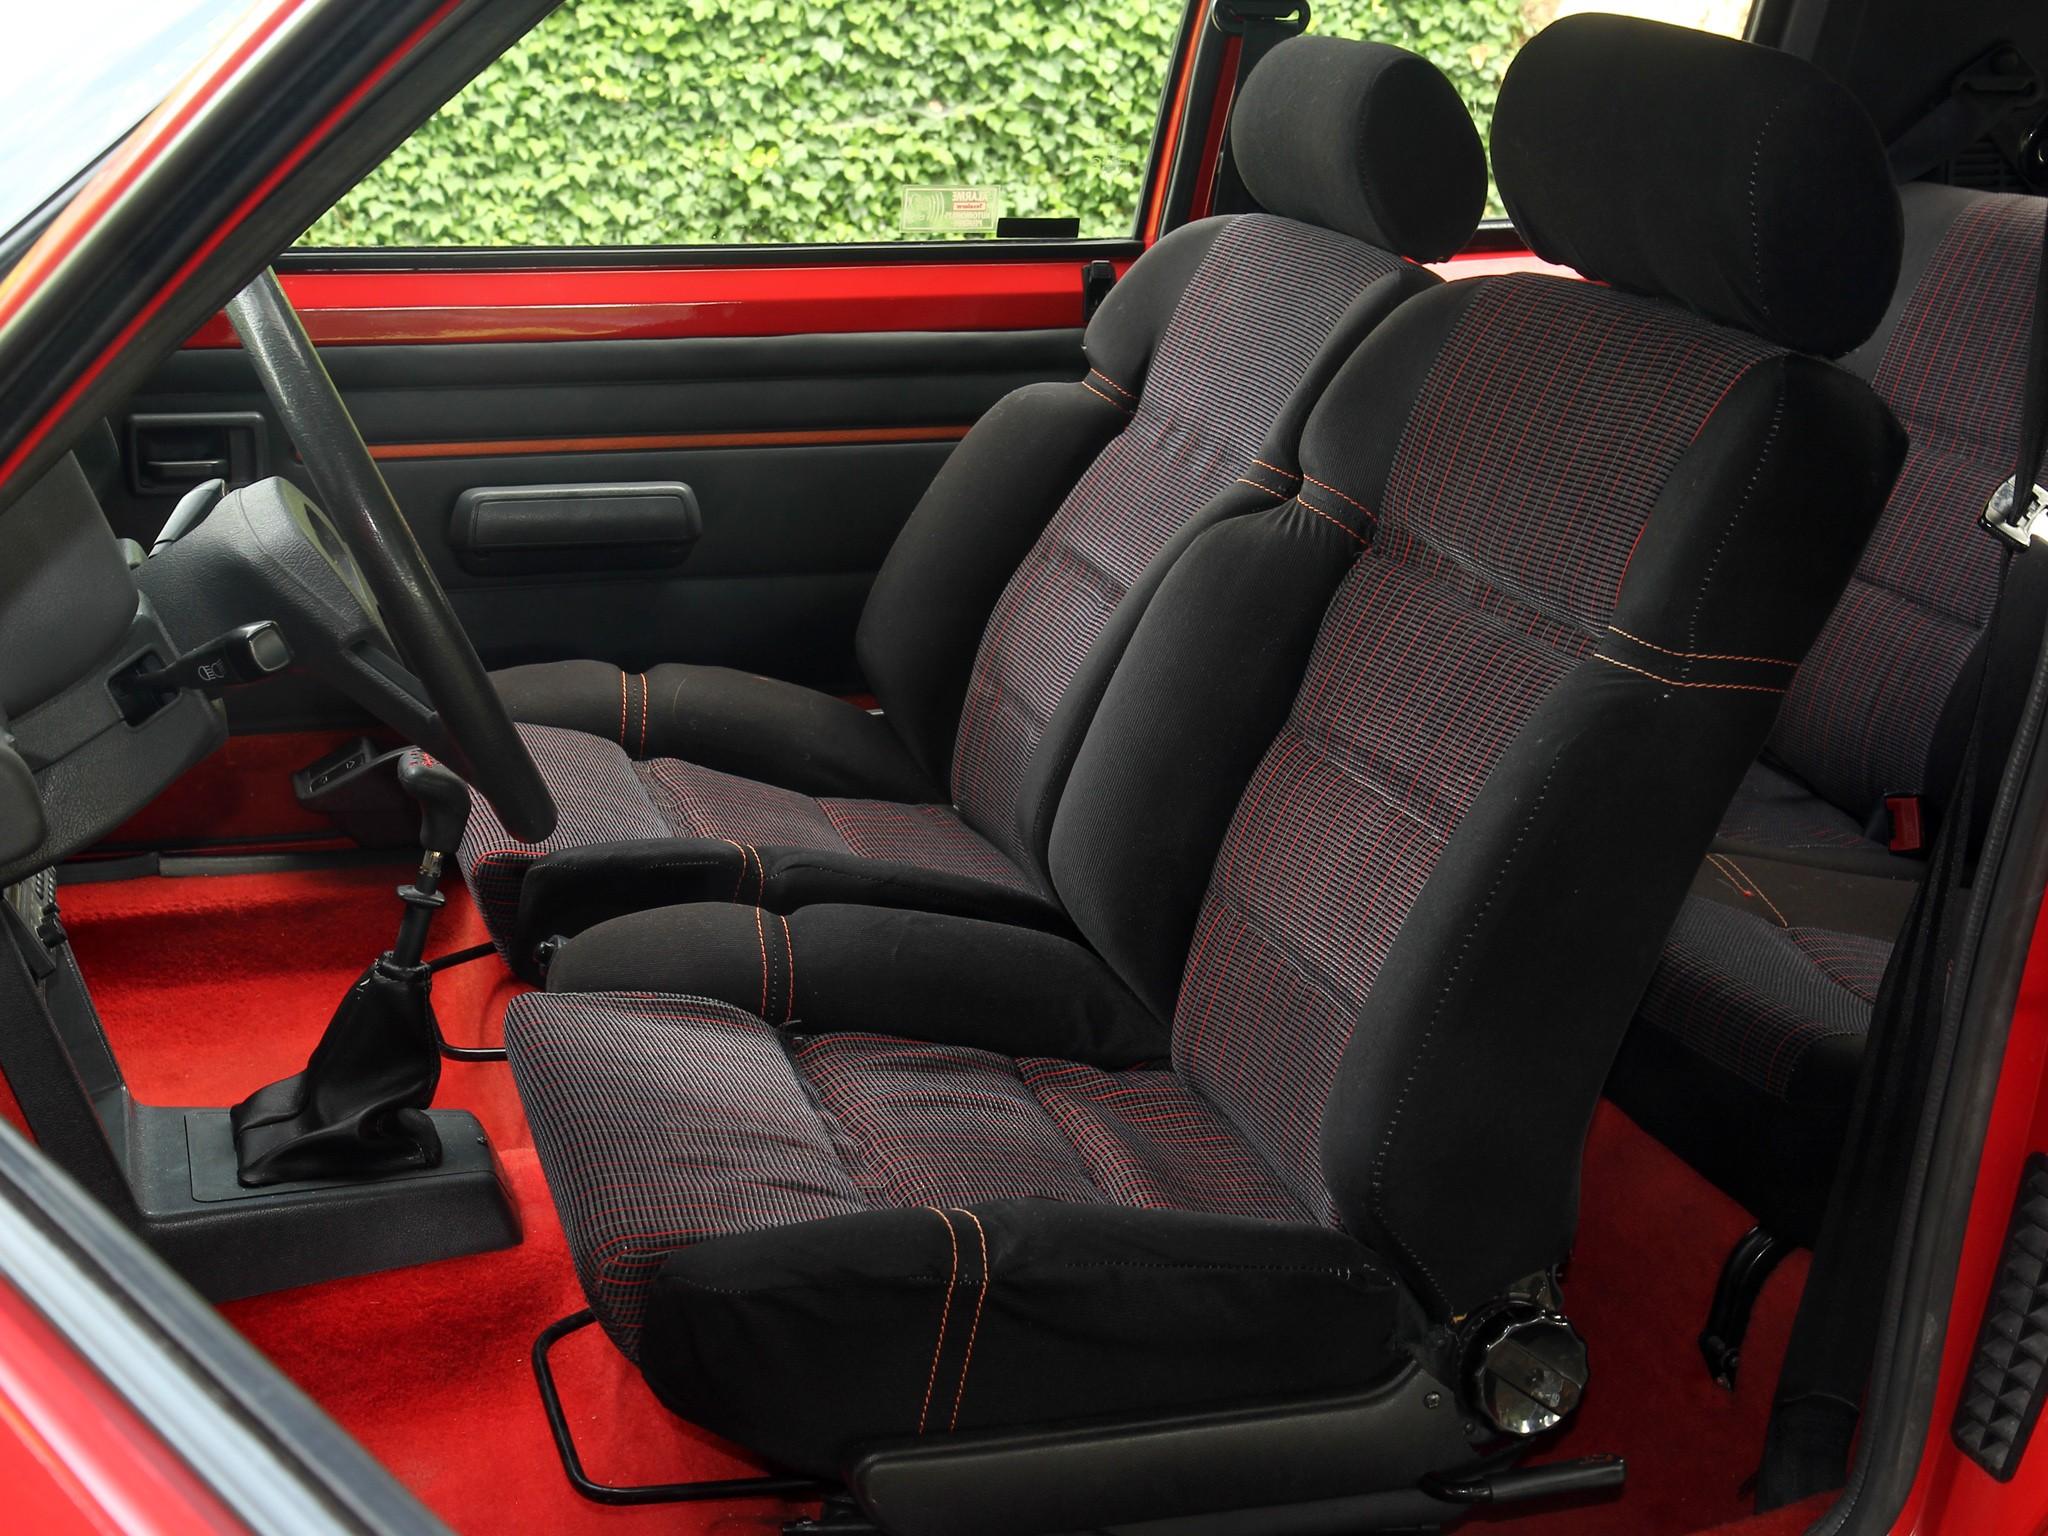 Peugeot 205 gti specs 1984 1985 1986 1987 1988 1989 for Housse 205 gti